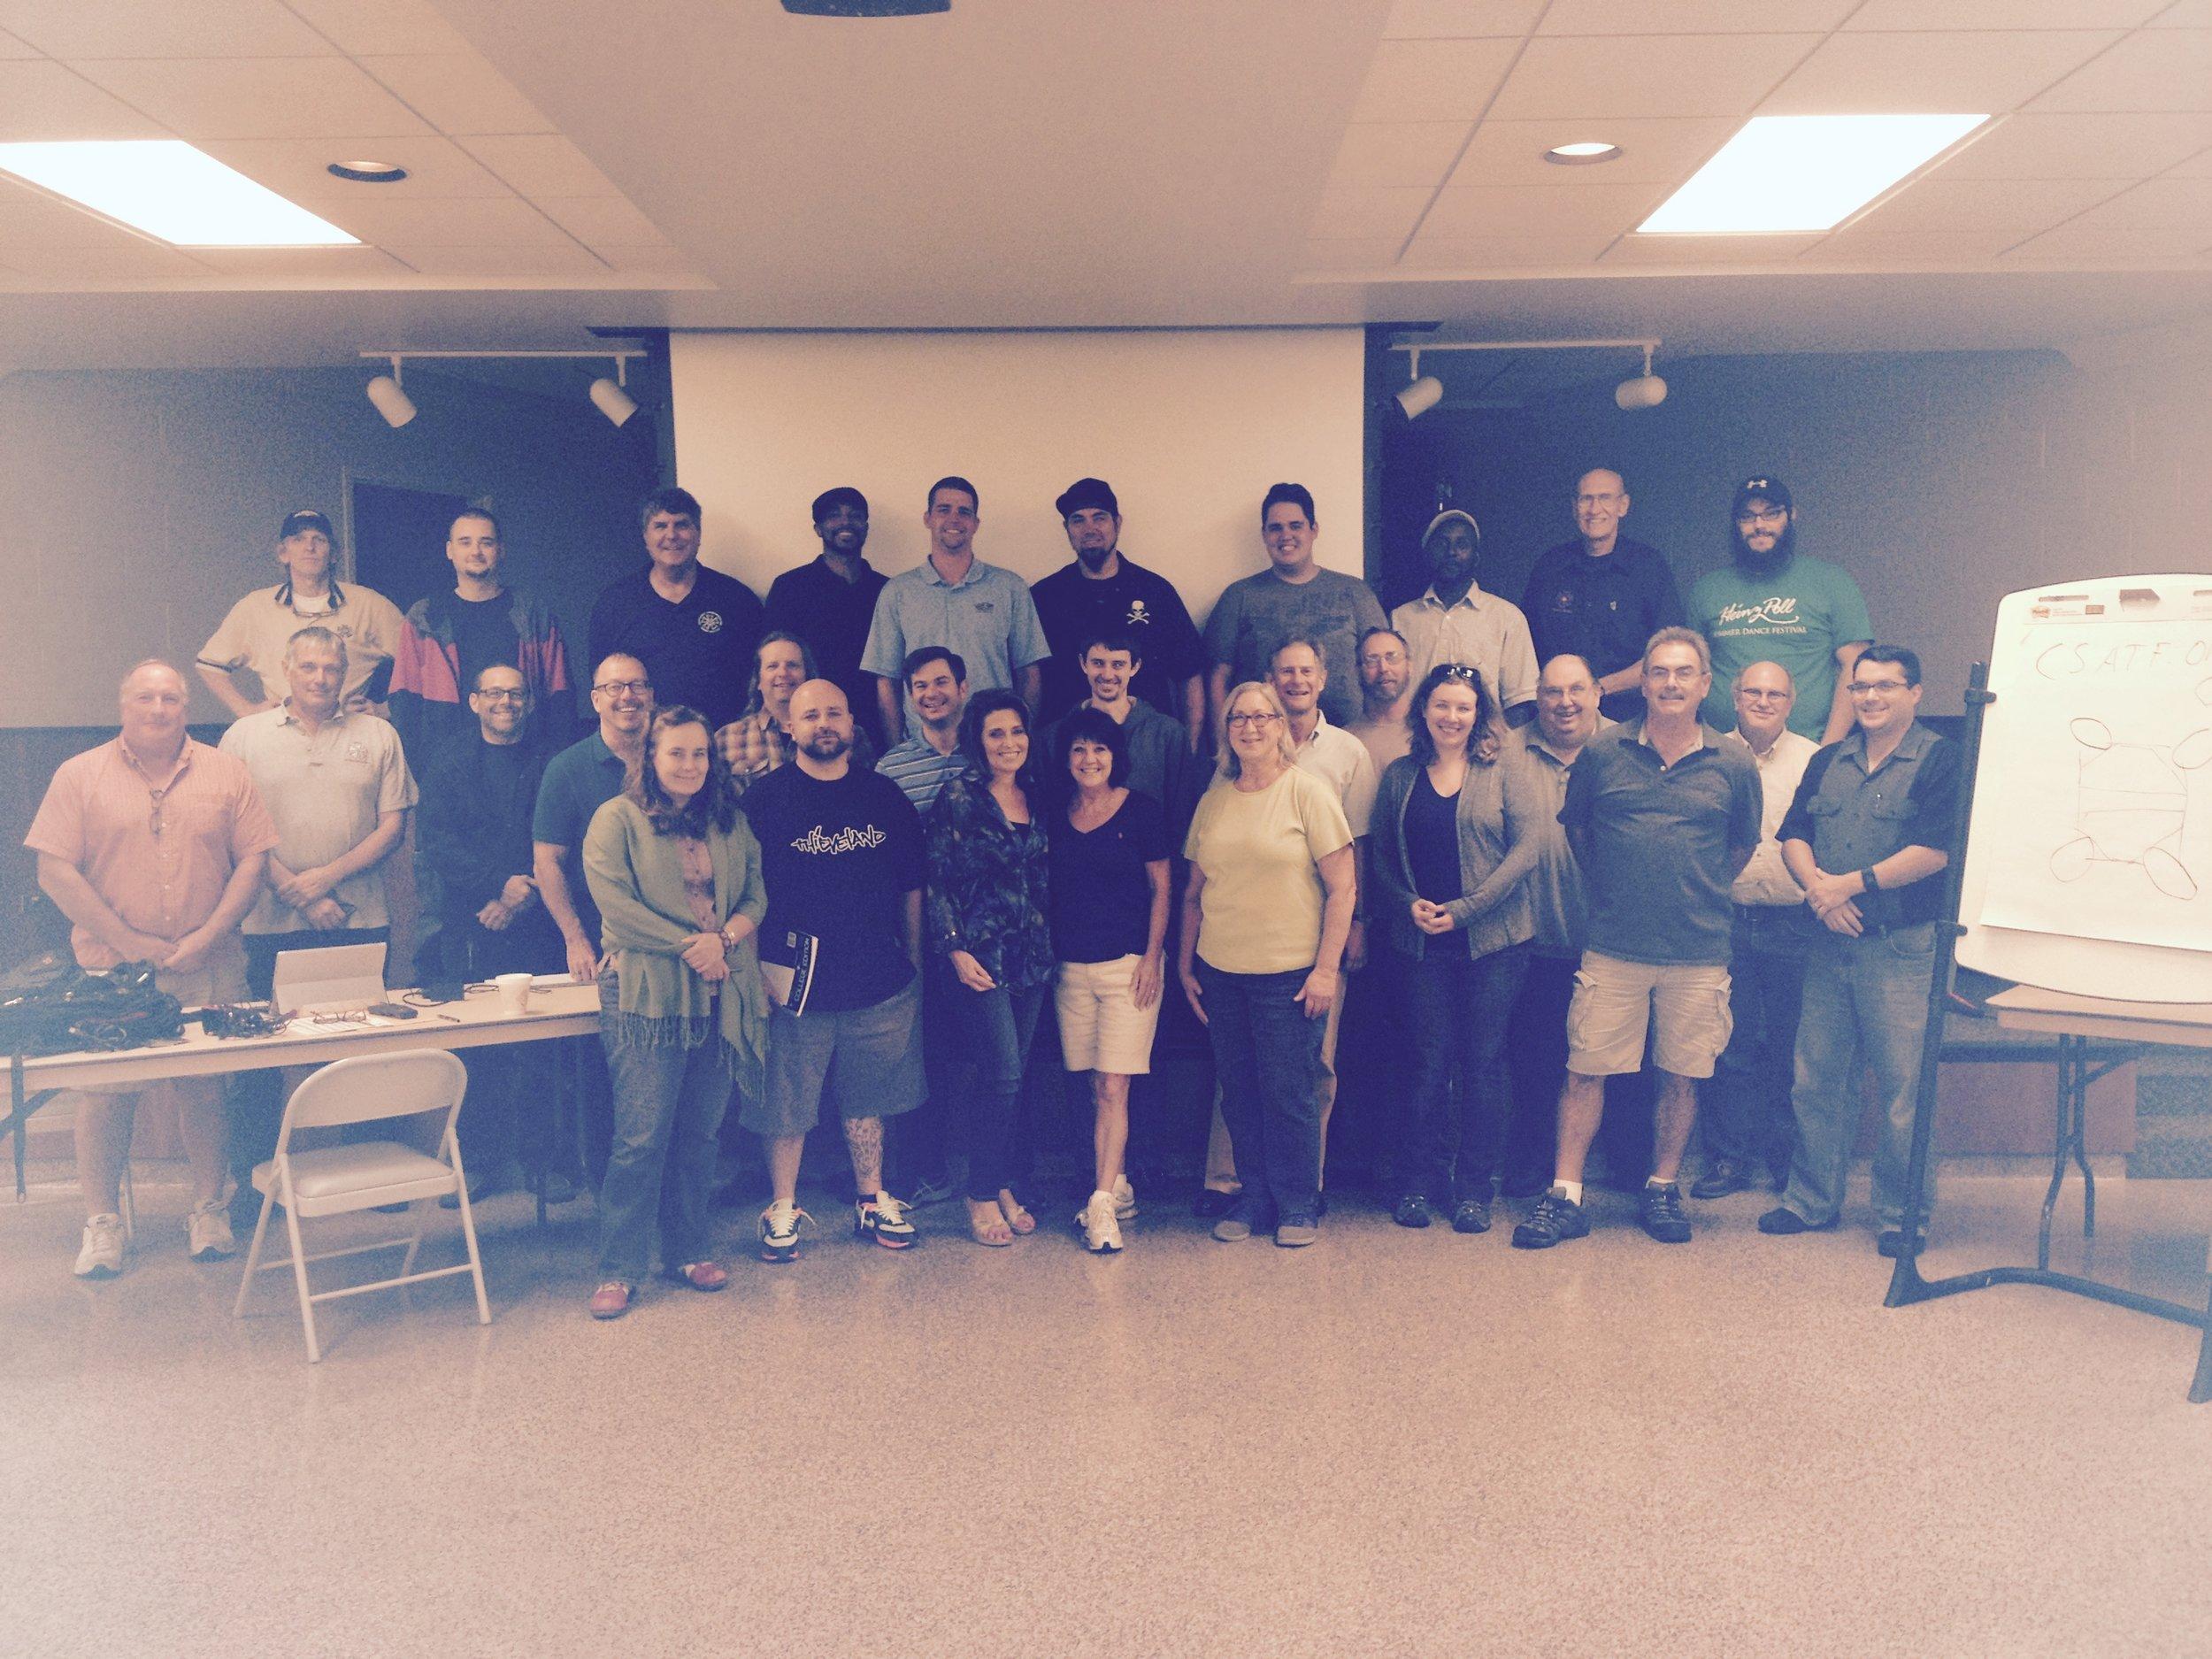 IATSE TTF OSHA 10/General Entertainment Safety in Cleveland, OH | September 17 & 18, 2015